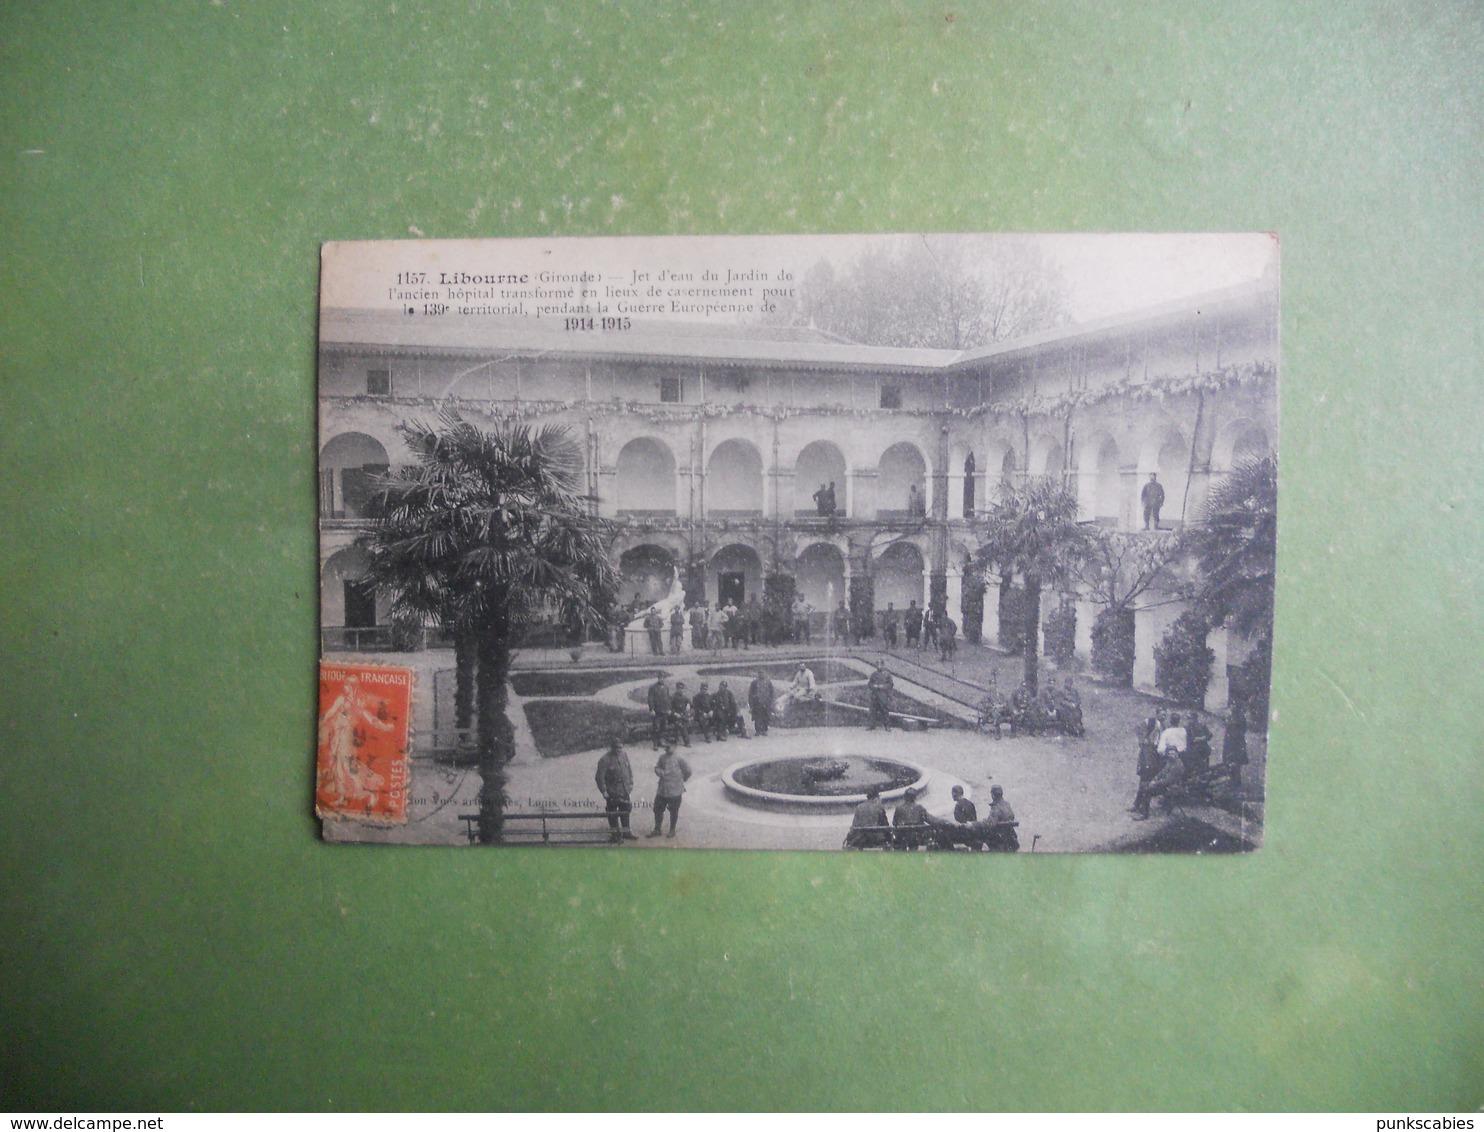 CPA GIRONDE LIBOURNE ANCIEN HOPITAL TRANSFORME EN CASERNEMENT POUR LE 139 Ieme TERRITORIAL GUERRE EUROPEENNE 1914/15 - Libourne